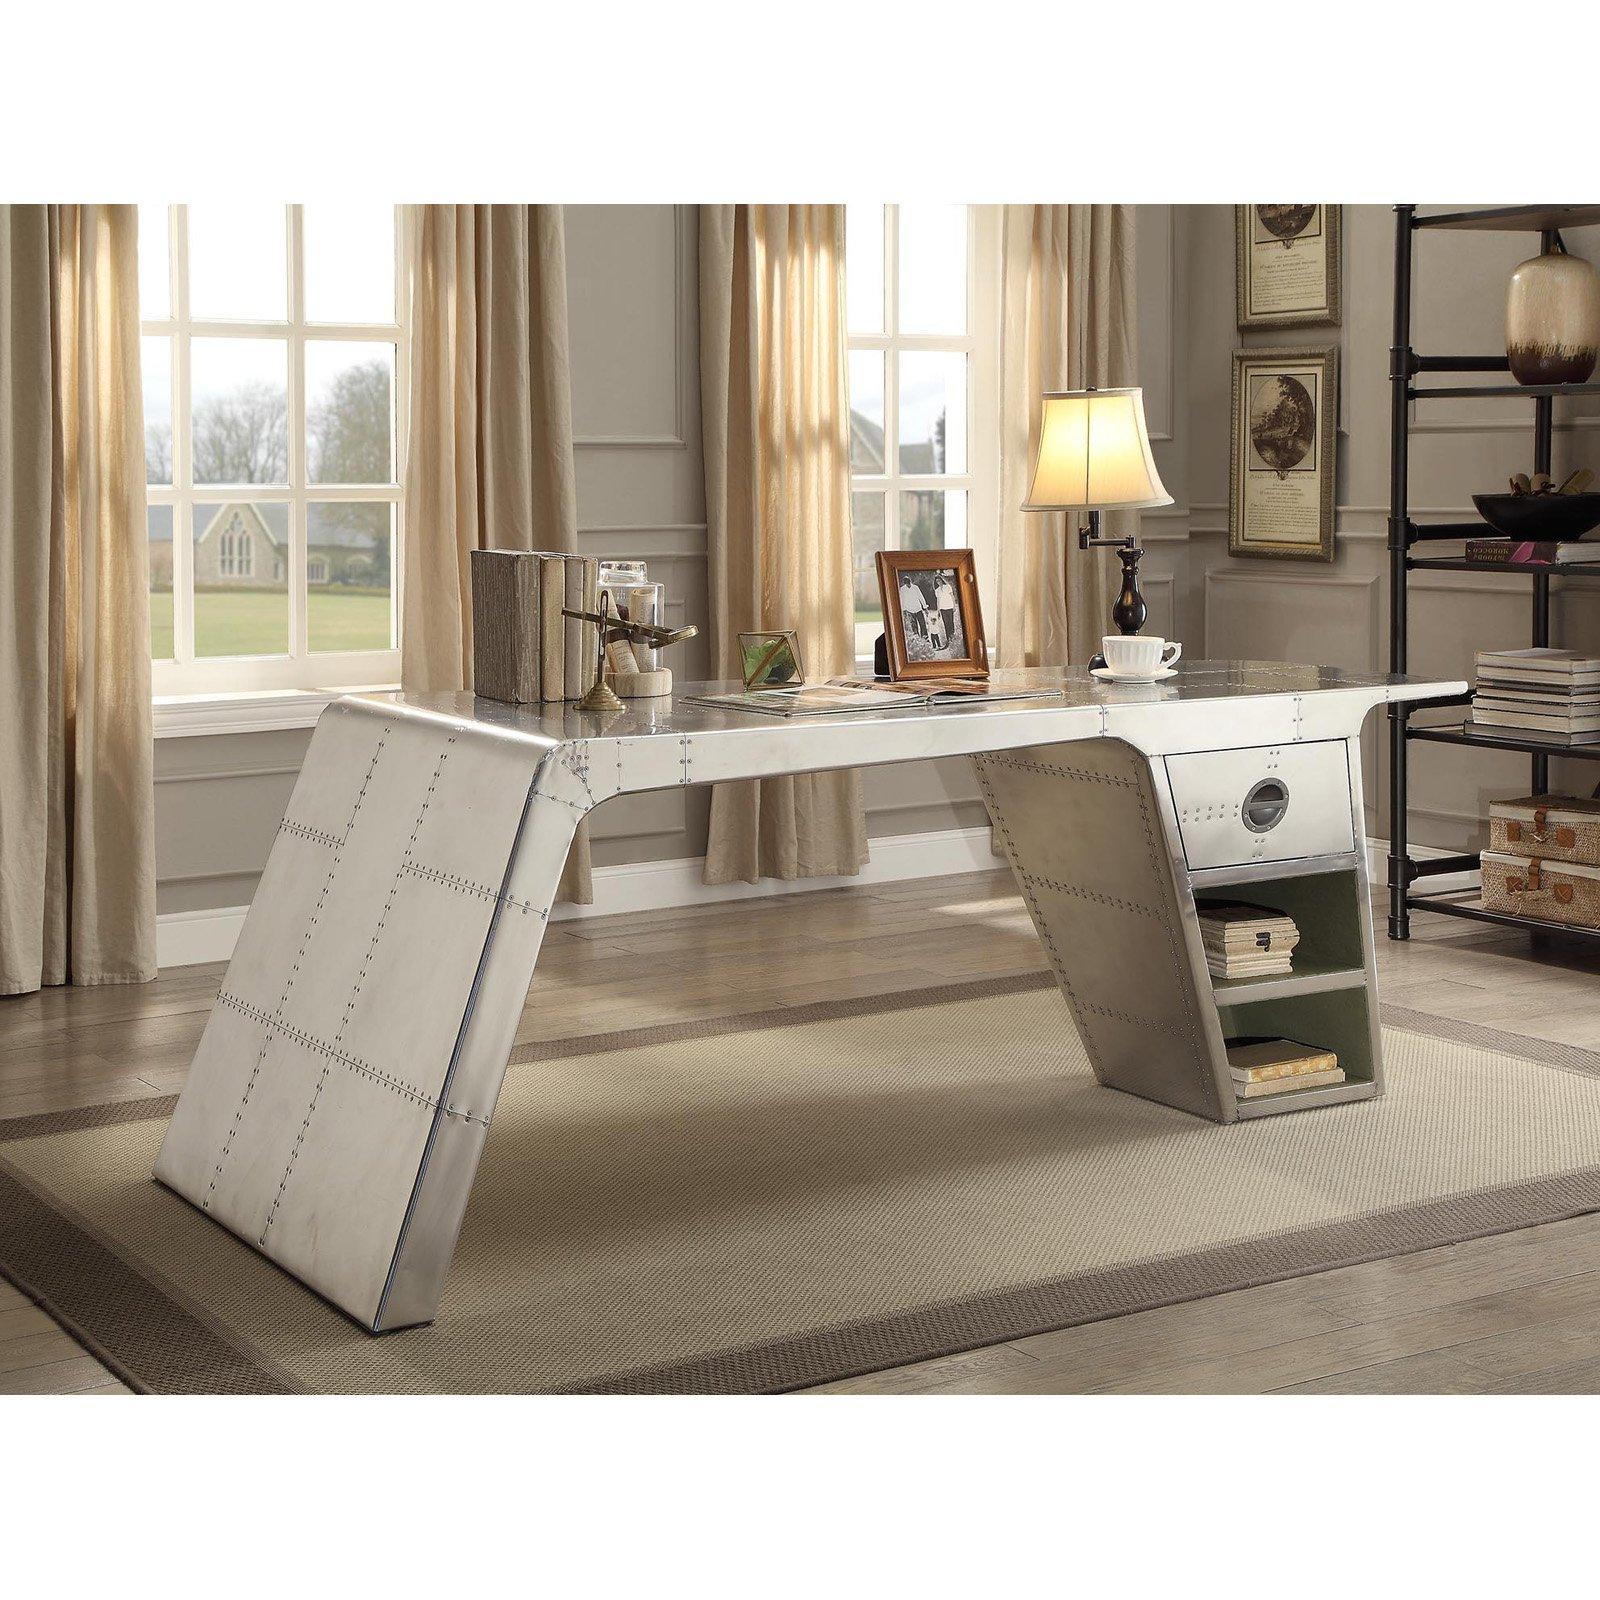 Image of Acme Brancaster Desk, Aluminum